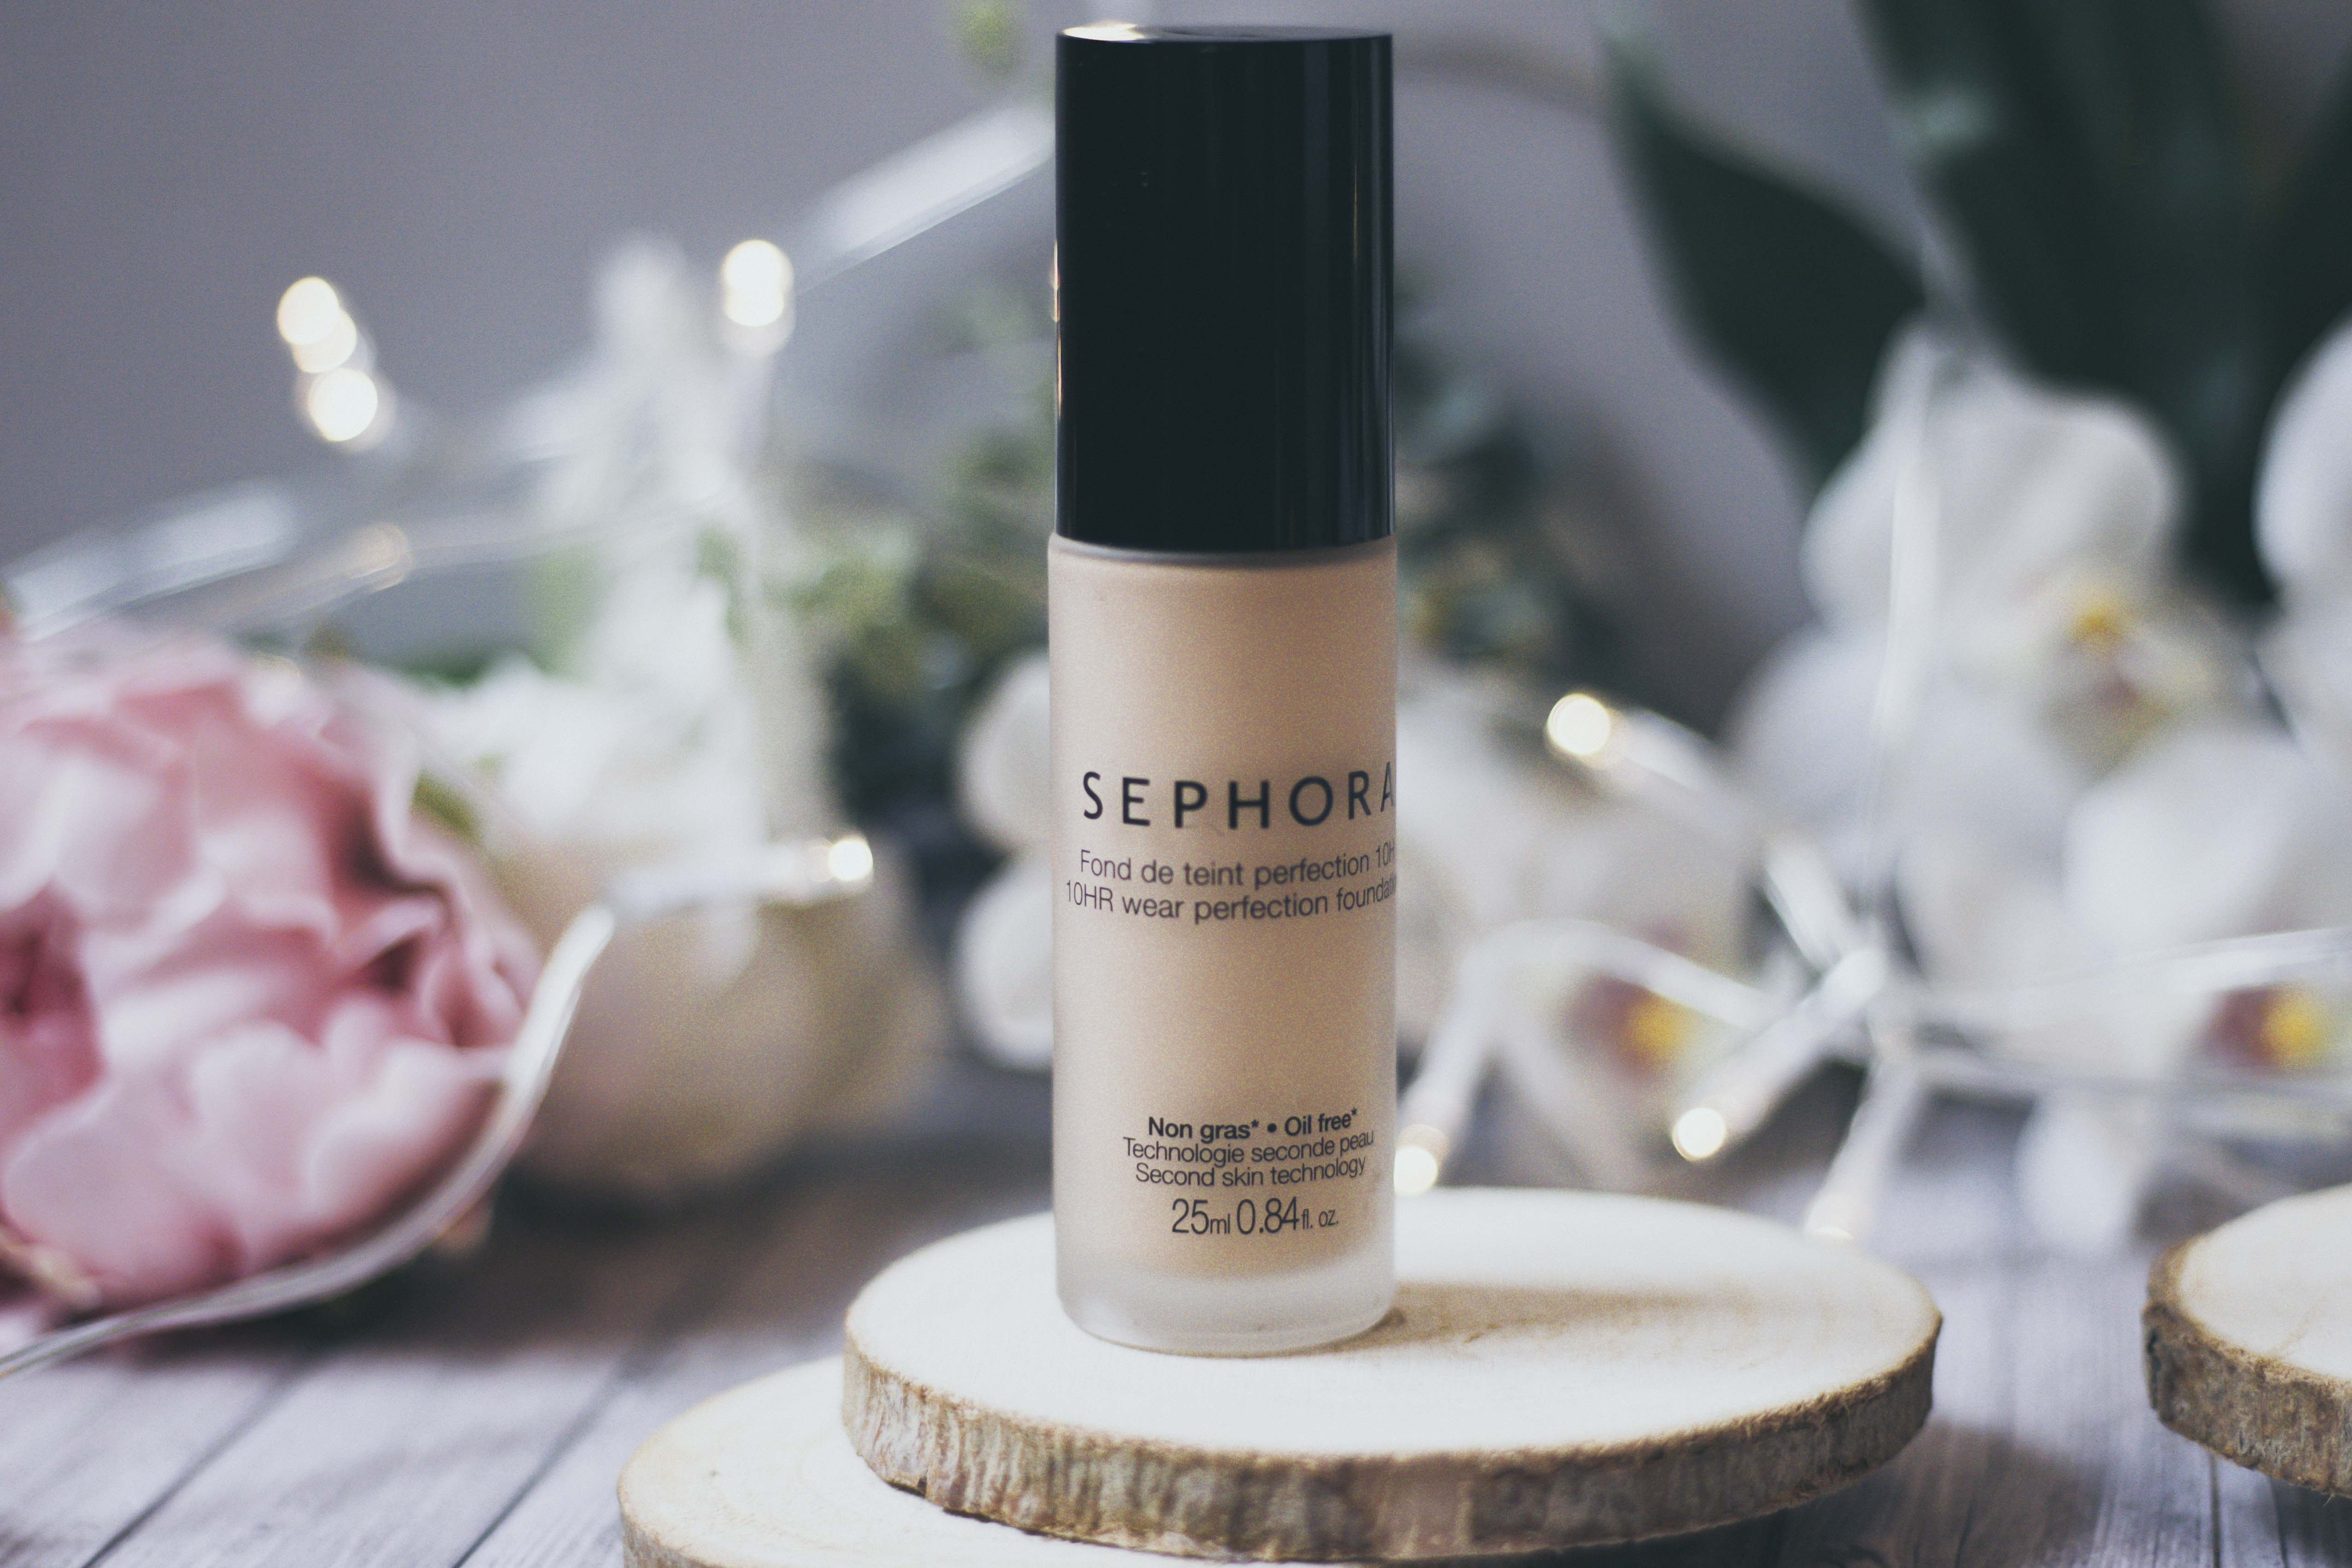 Fond de teint Sephora perfection 10h